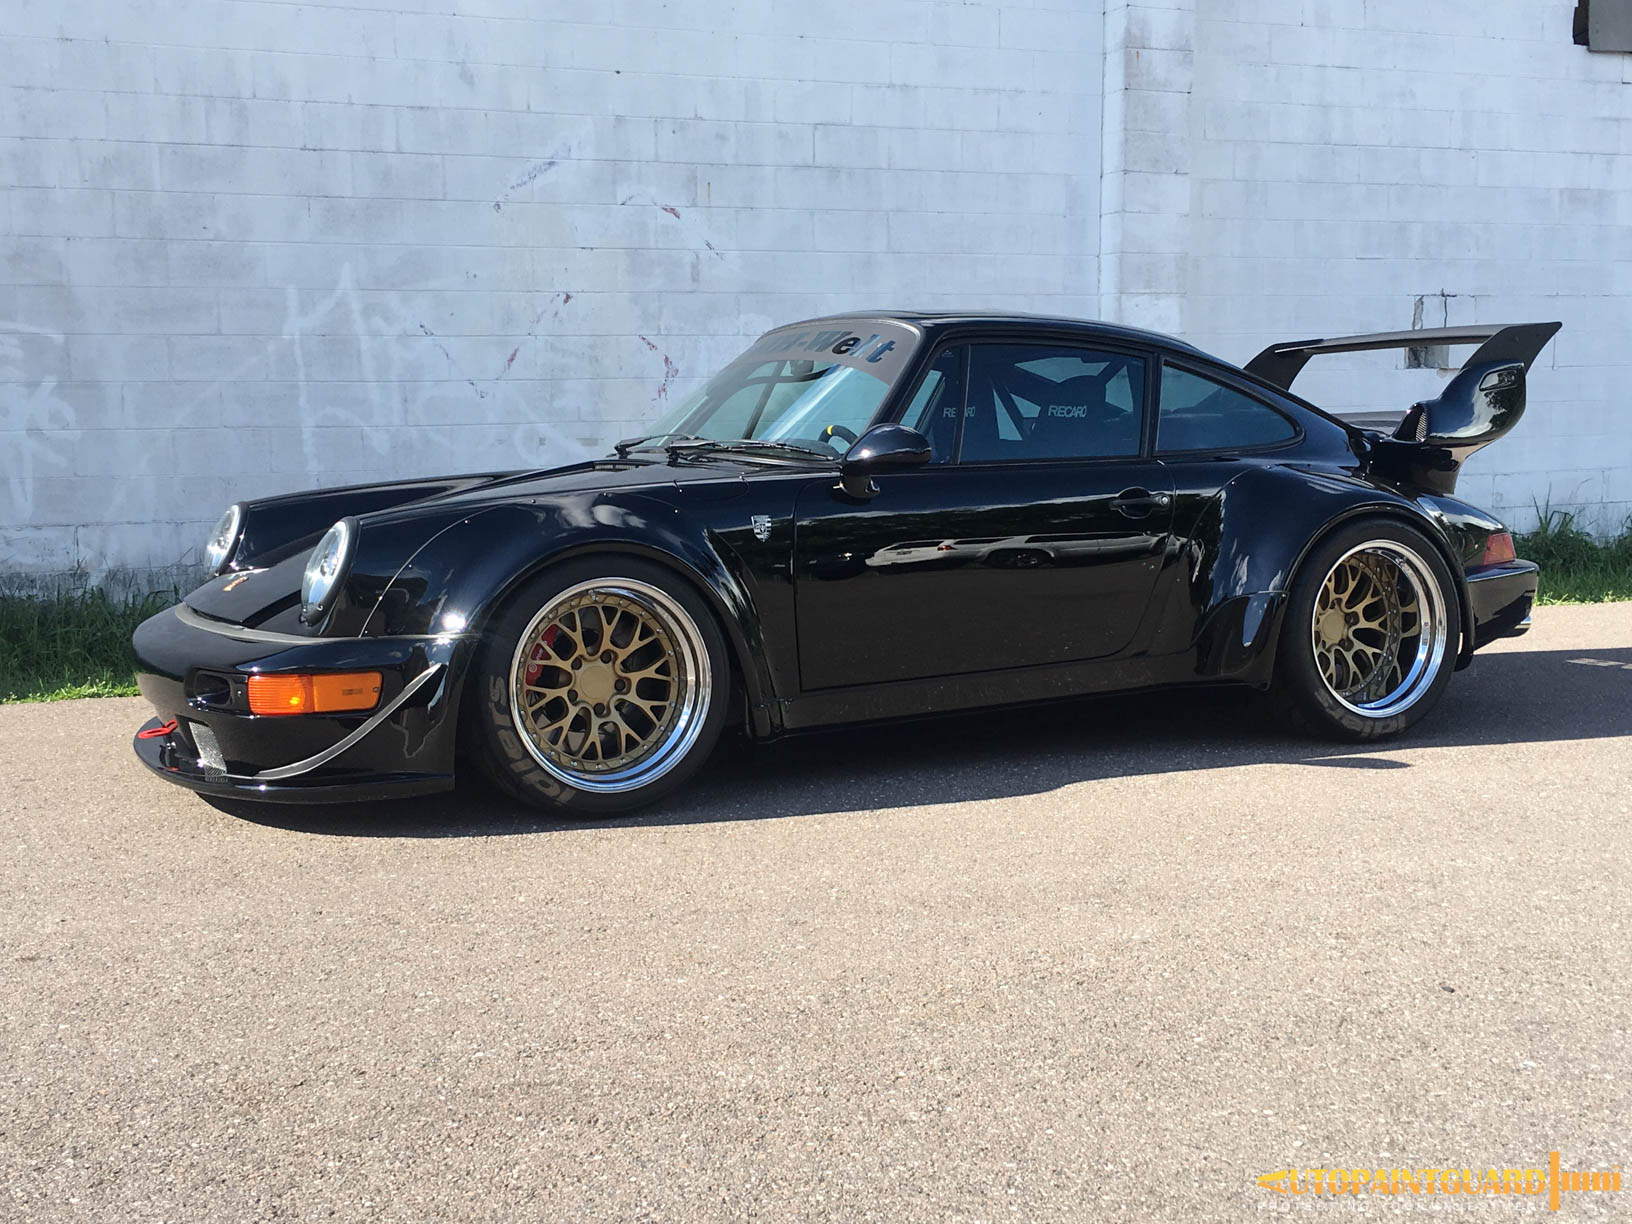 Auto Detailing Service - Paint Correction - Luxury Cars - Tampa Florida - Auto Paint Guard